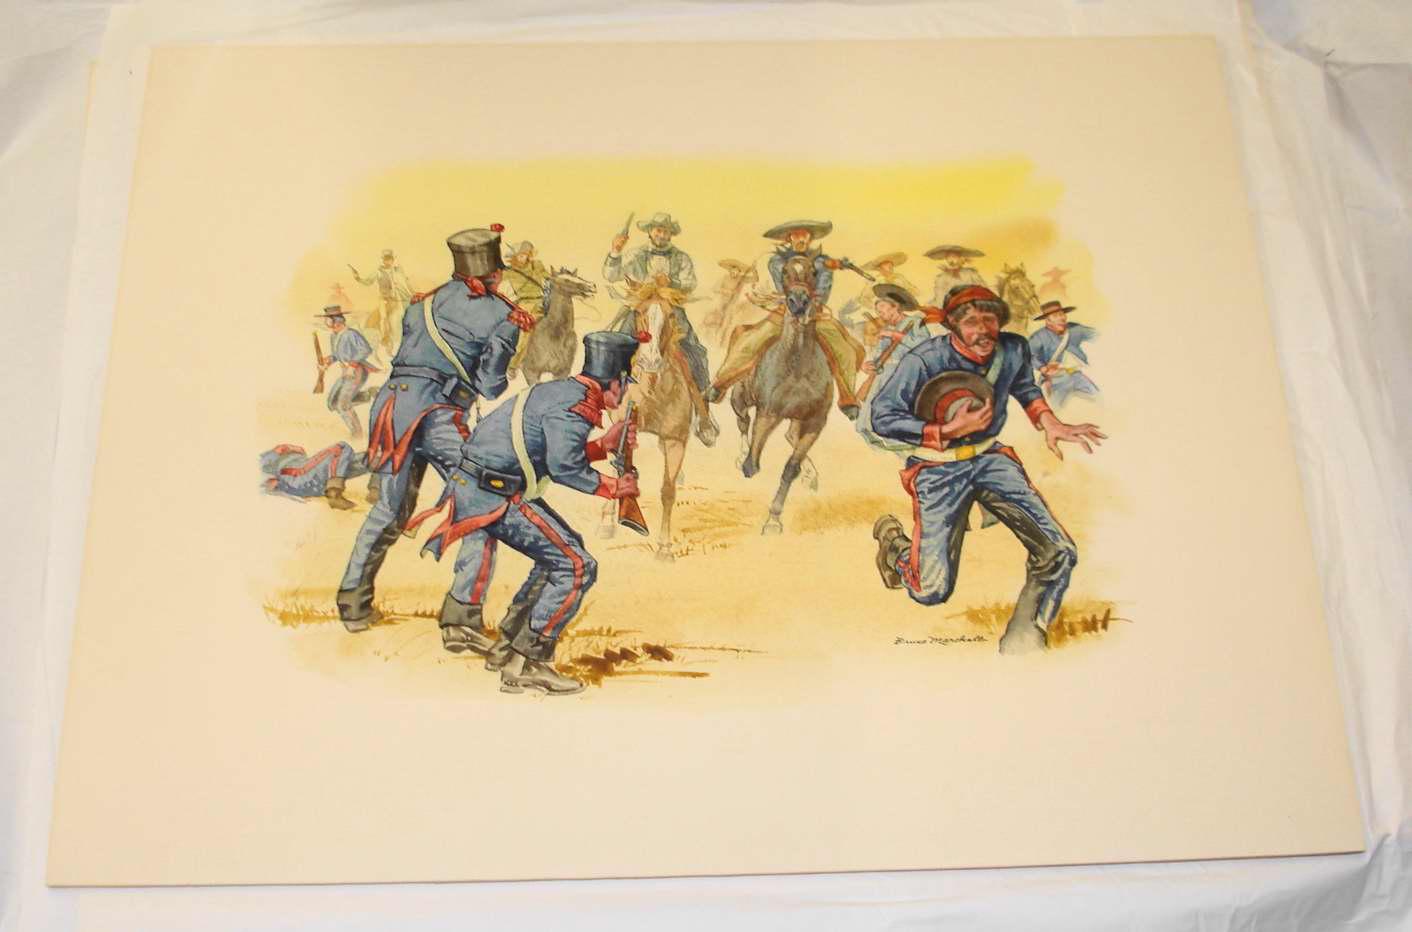 Object: Painting (Texas Rangers at Laredo, 1840) | UTSA Institute Of Texan Cultures